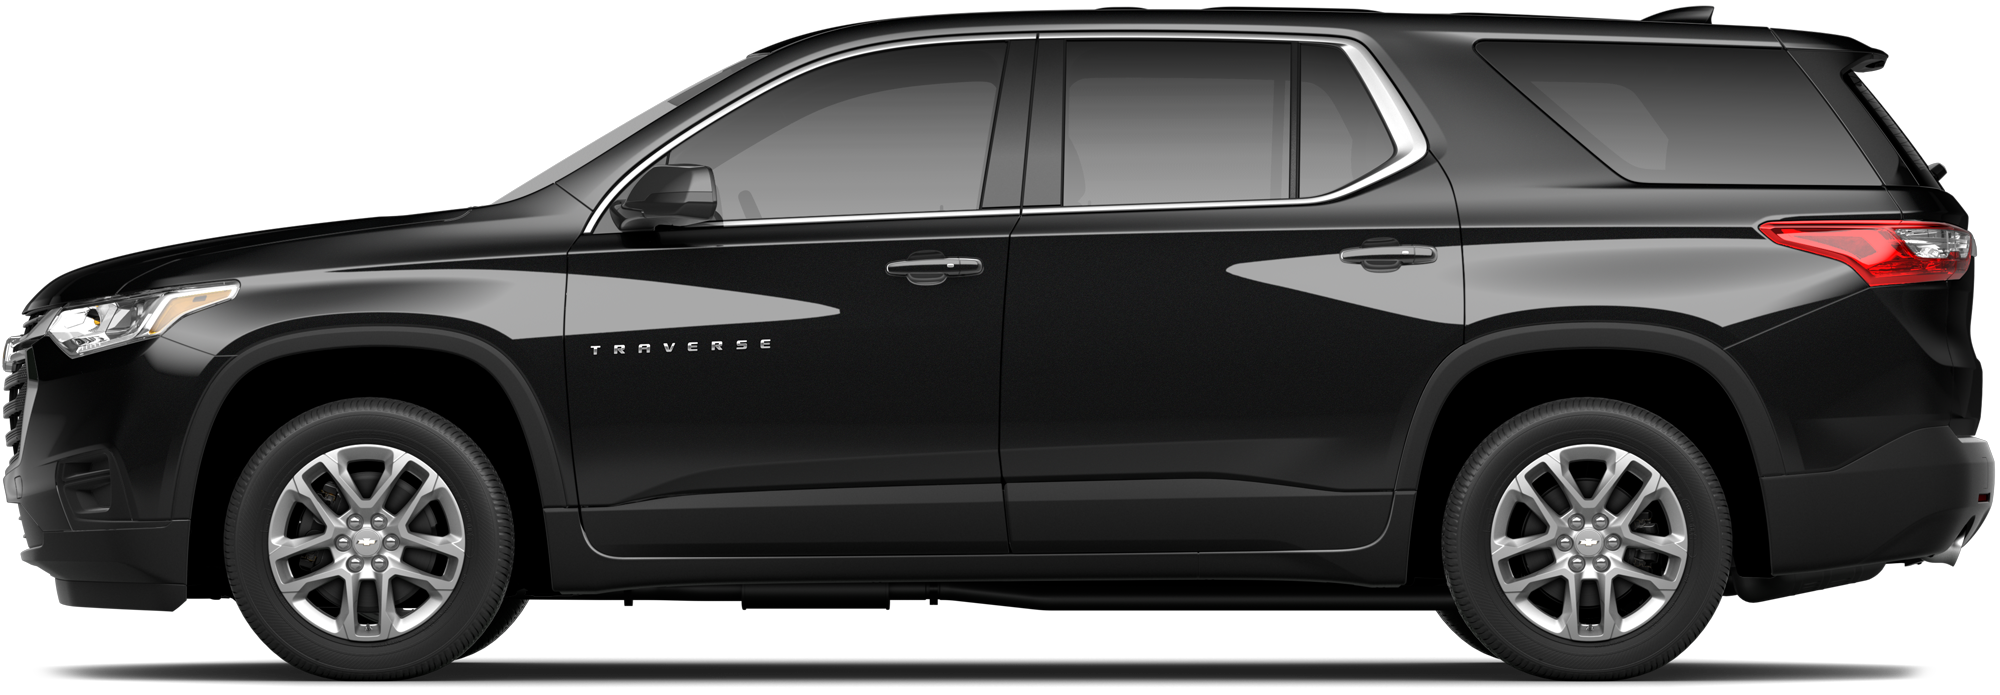 2020 Chevrolet Traverse SUV LS w/1LS